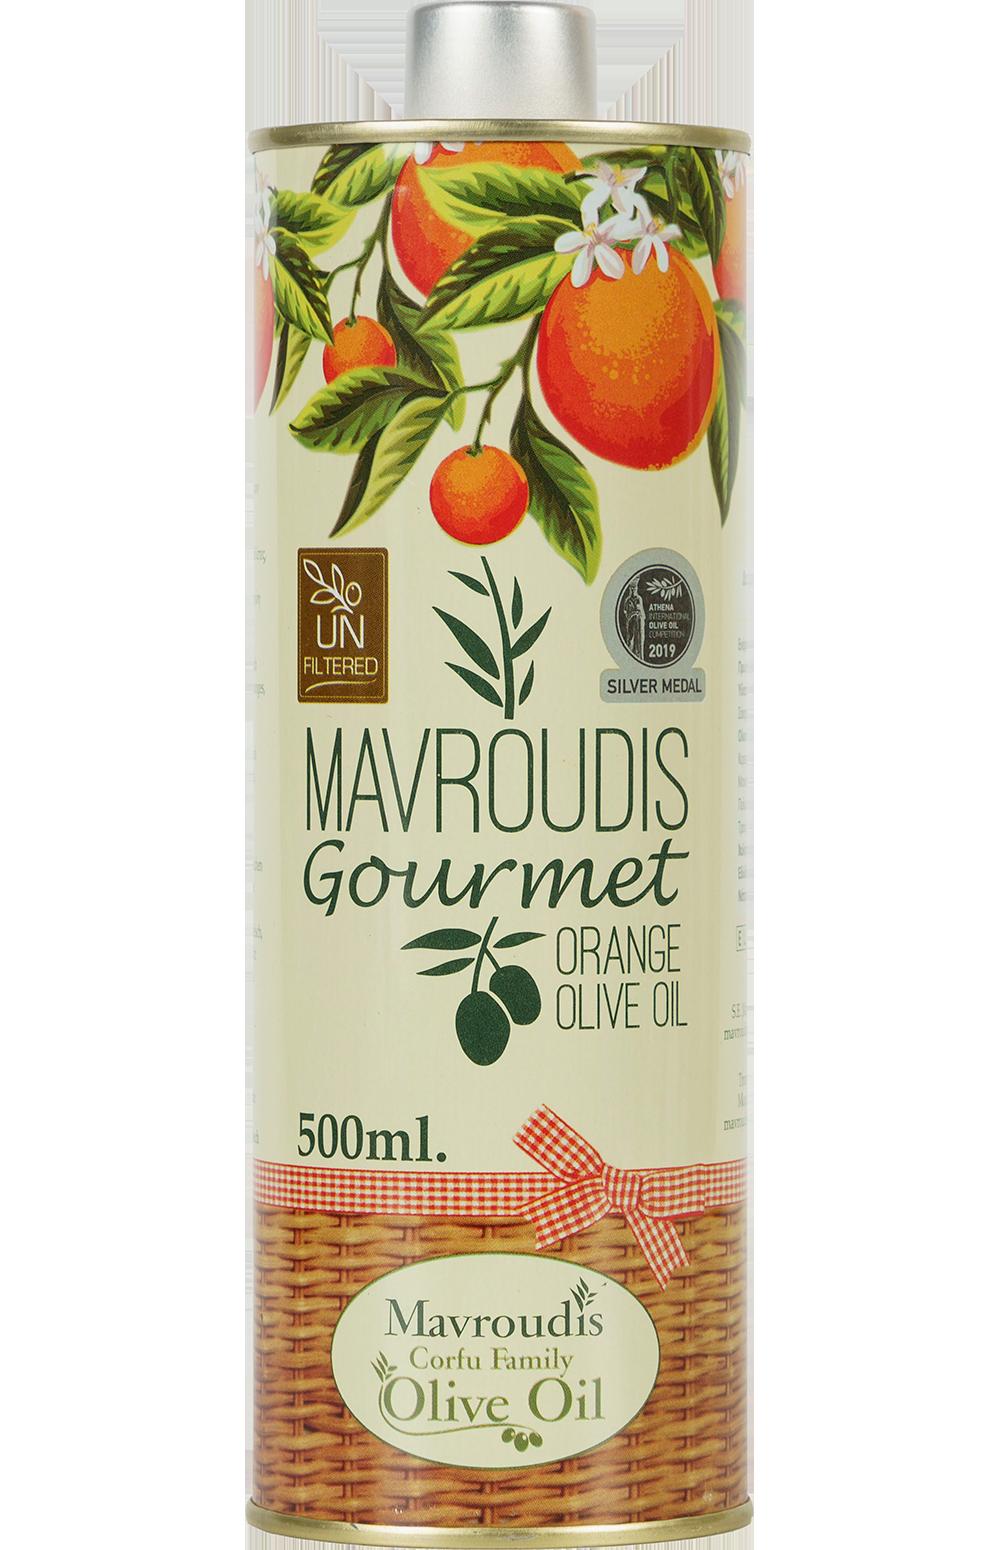 Mavroudis Gourmet Orange